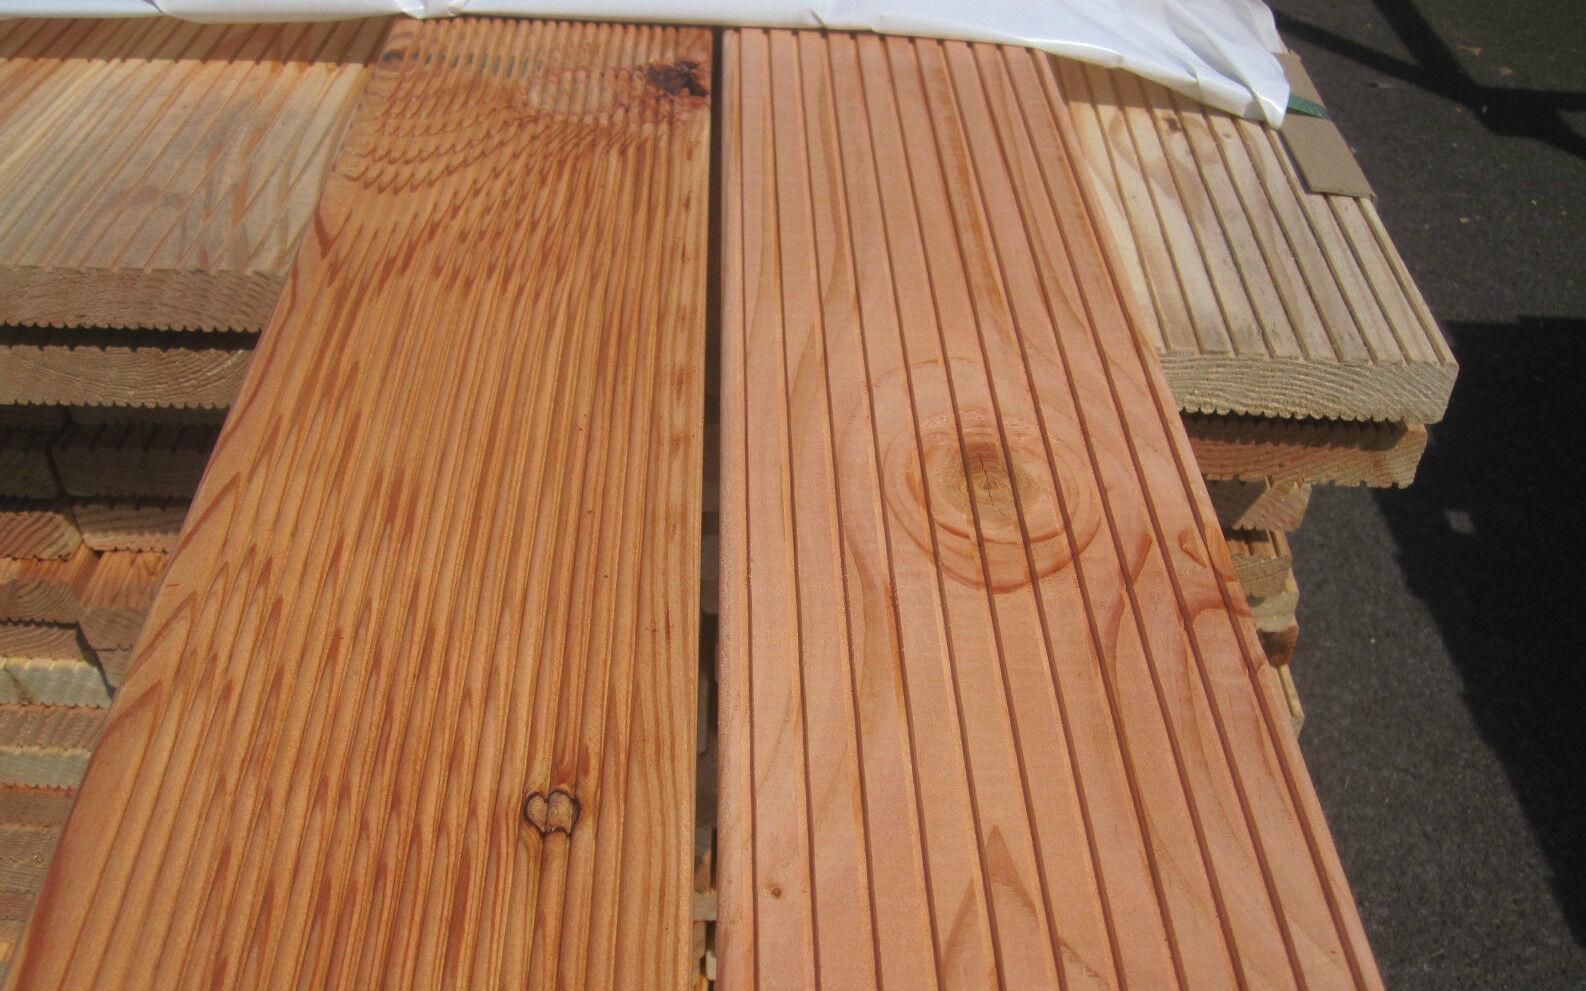 40 m douglasie 2 wahl terrassendielen terrassenholz holz l rche farbig 2 m lang eur 300 00. Black Bedroom Furniture Sets. Home Design Ideas